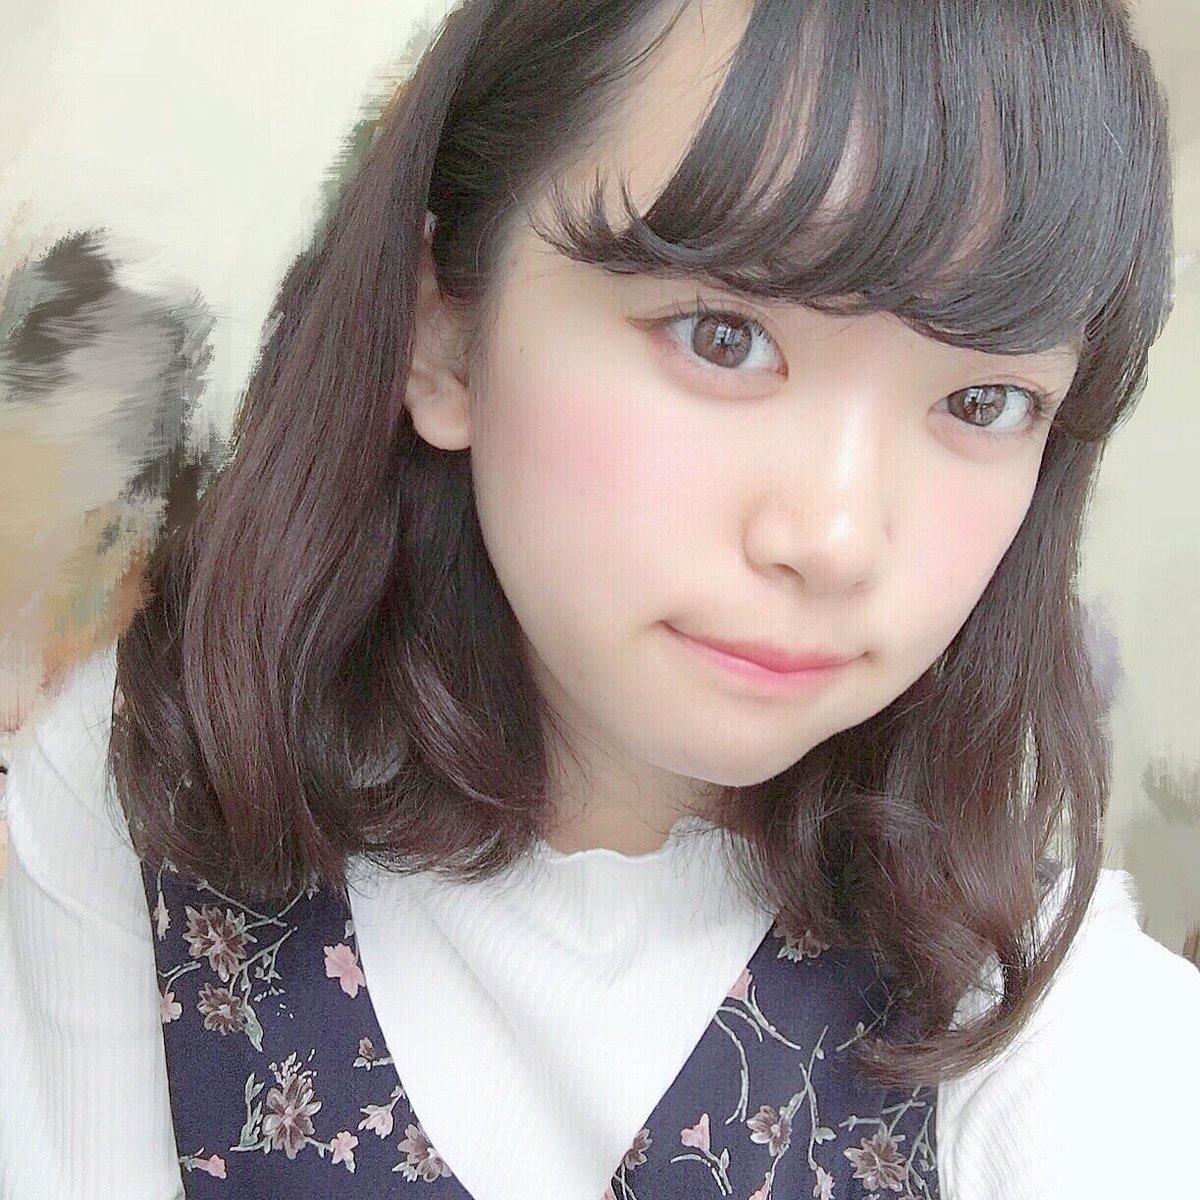 Yura Kano (S1 Cutie born 1998) - ScanLover 2.0 - Discuss